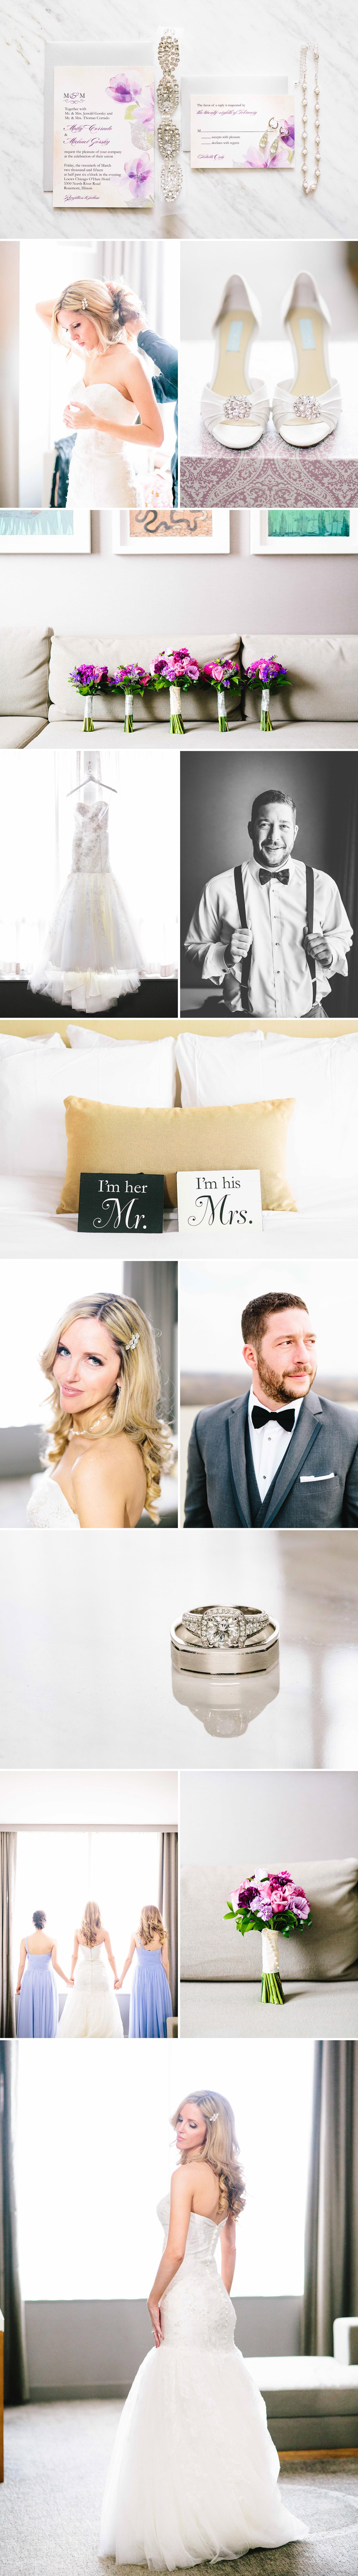 chicago-fine-art-wedding-photography-gorsky1